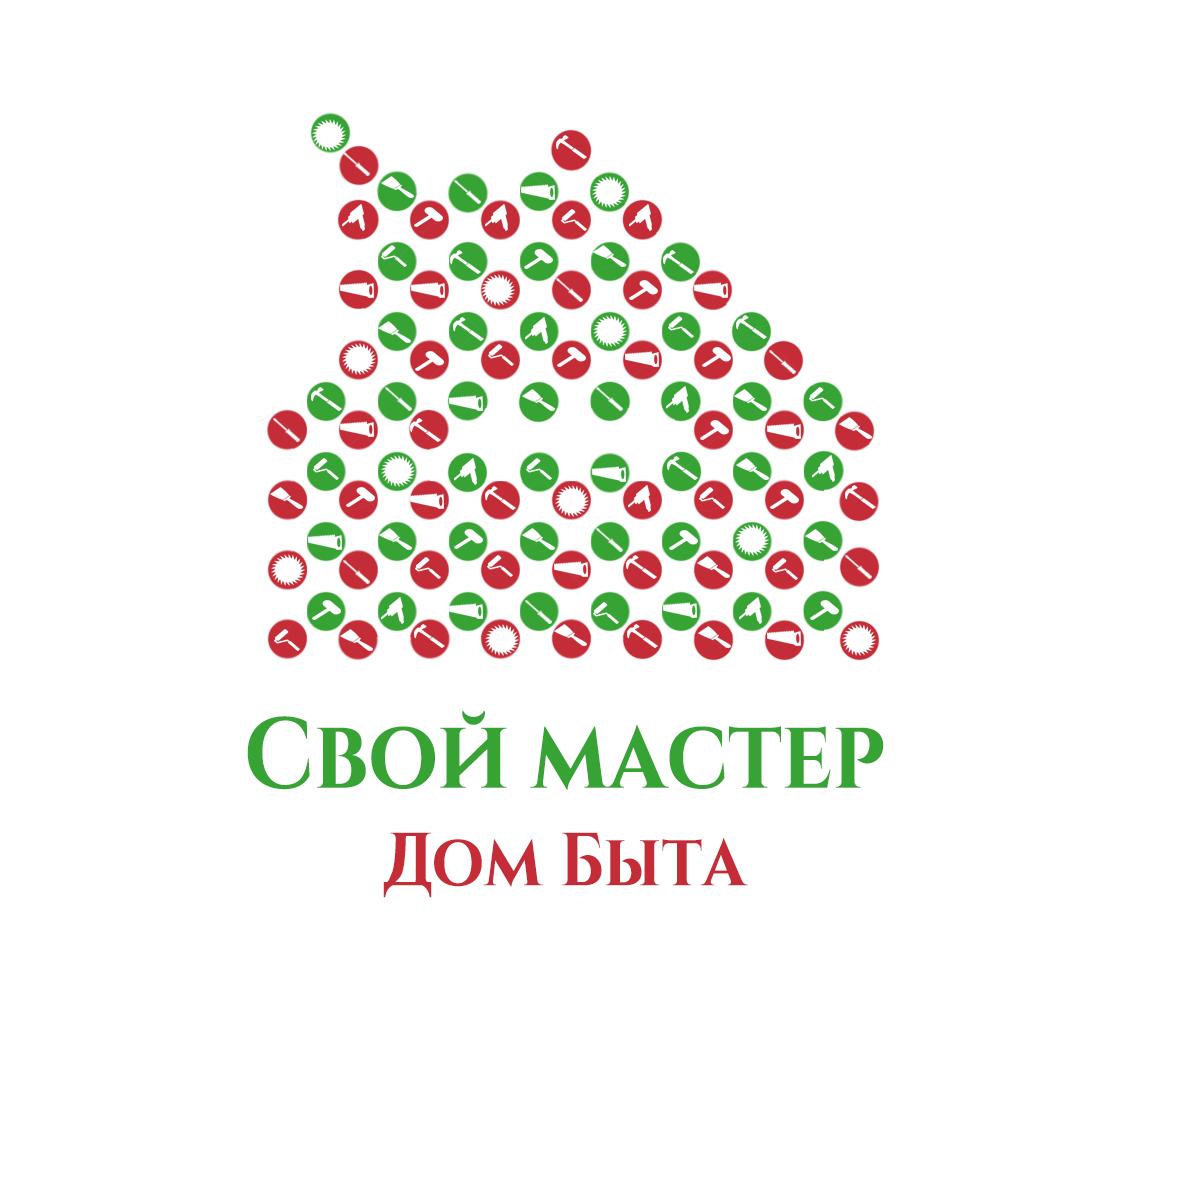 Логотип для сетевого ДОМ БЫТА фото f_4835d7a4e873f8d4.png